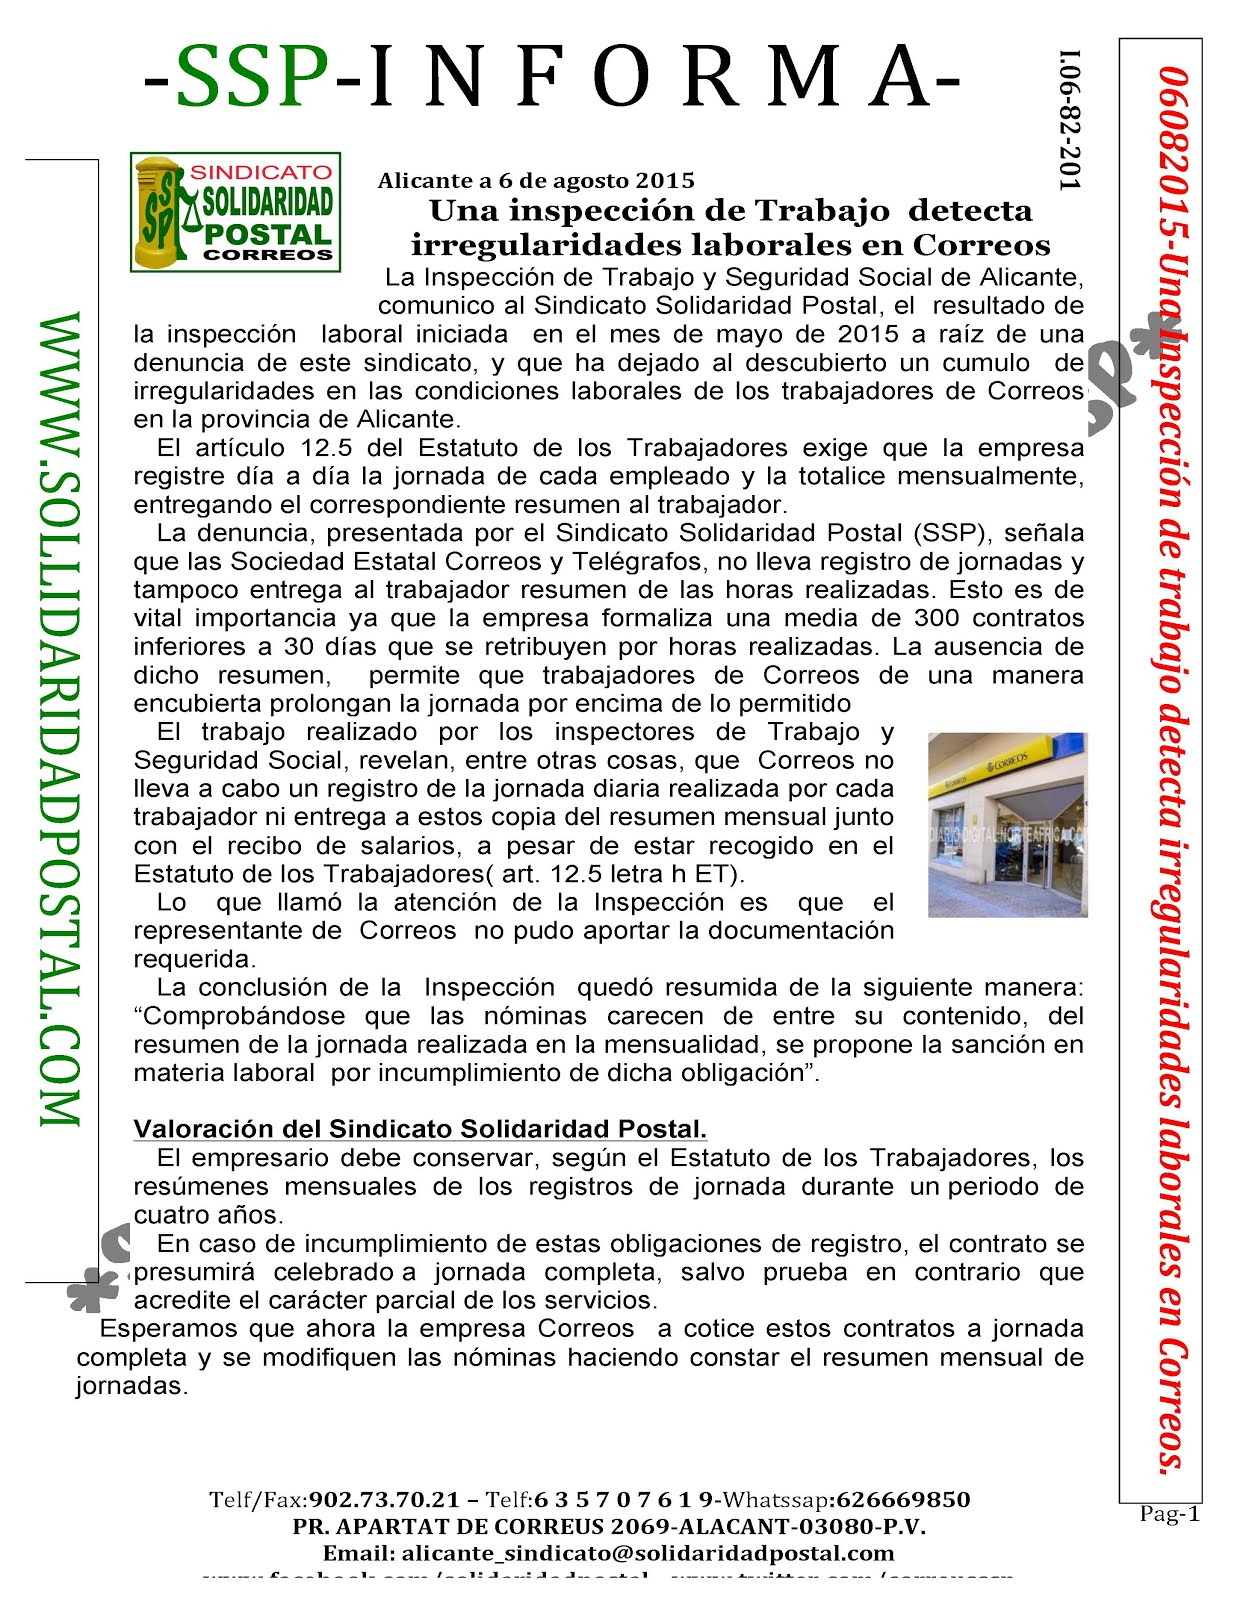 06/08/2015-SolidaridadPostal.com